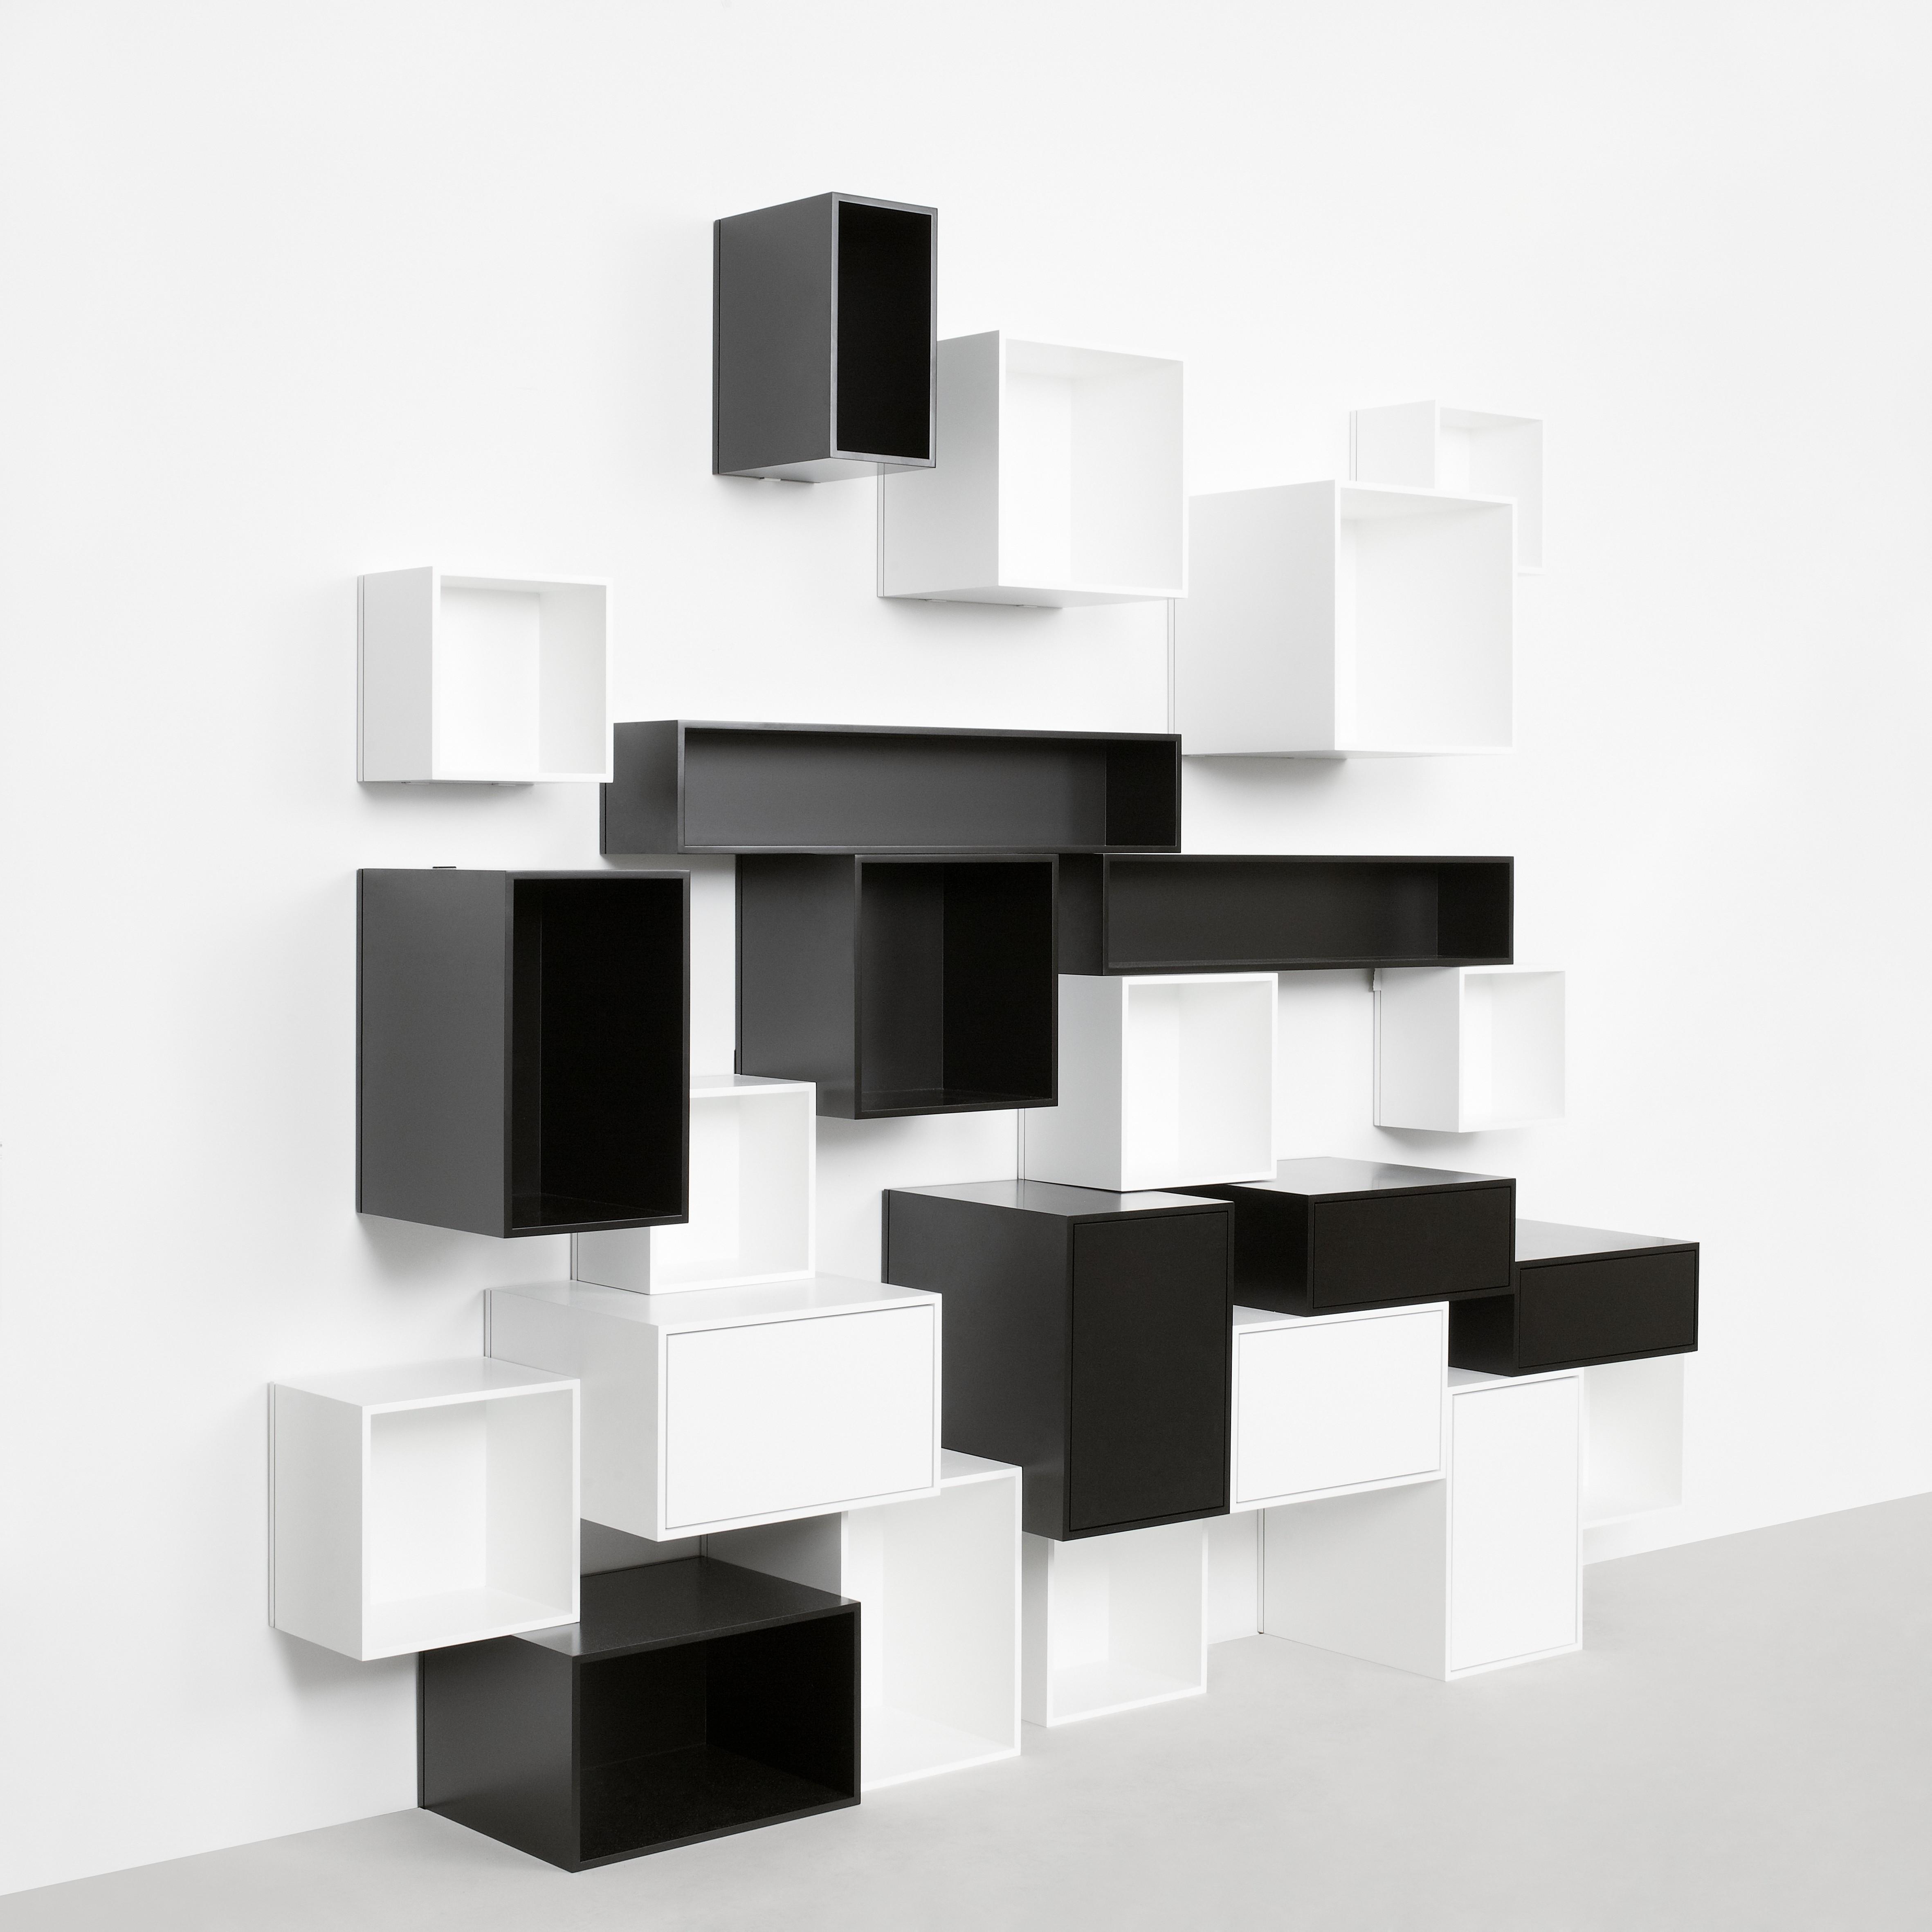 cubit bibliotheque etagere 50 la boite verte. Black Bedroom Furniture Sets. Home Design Ideas